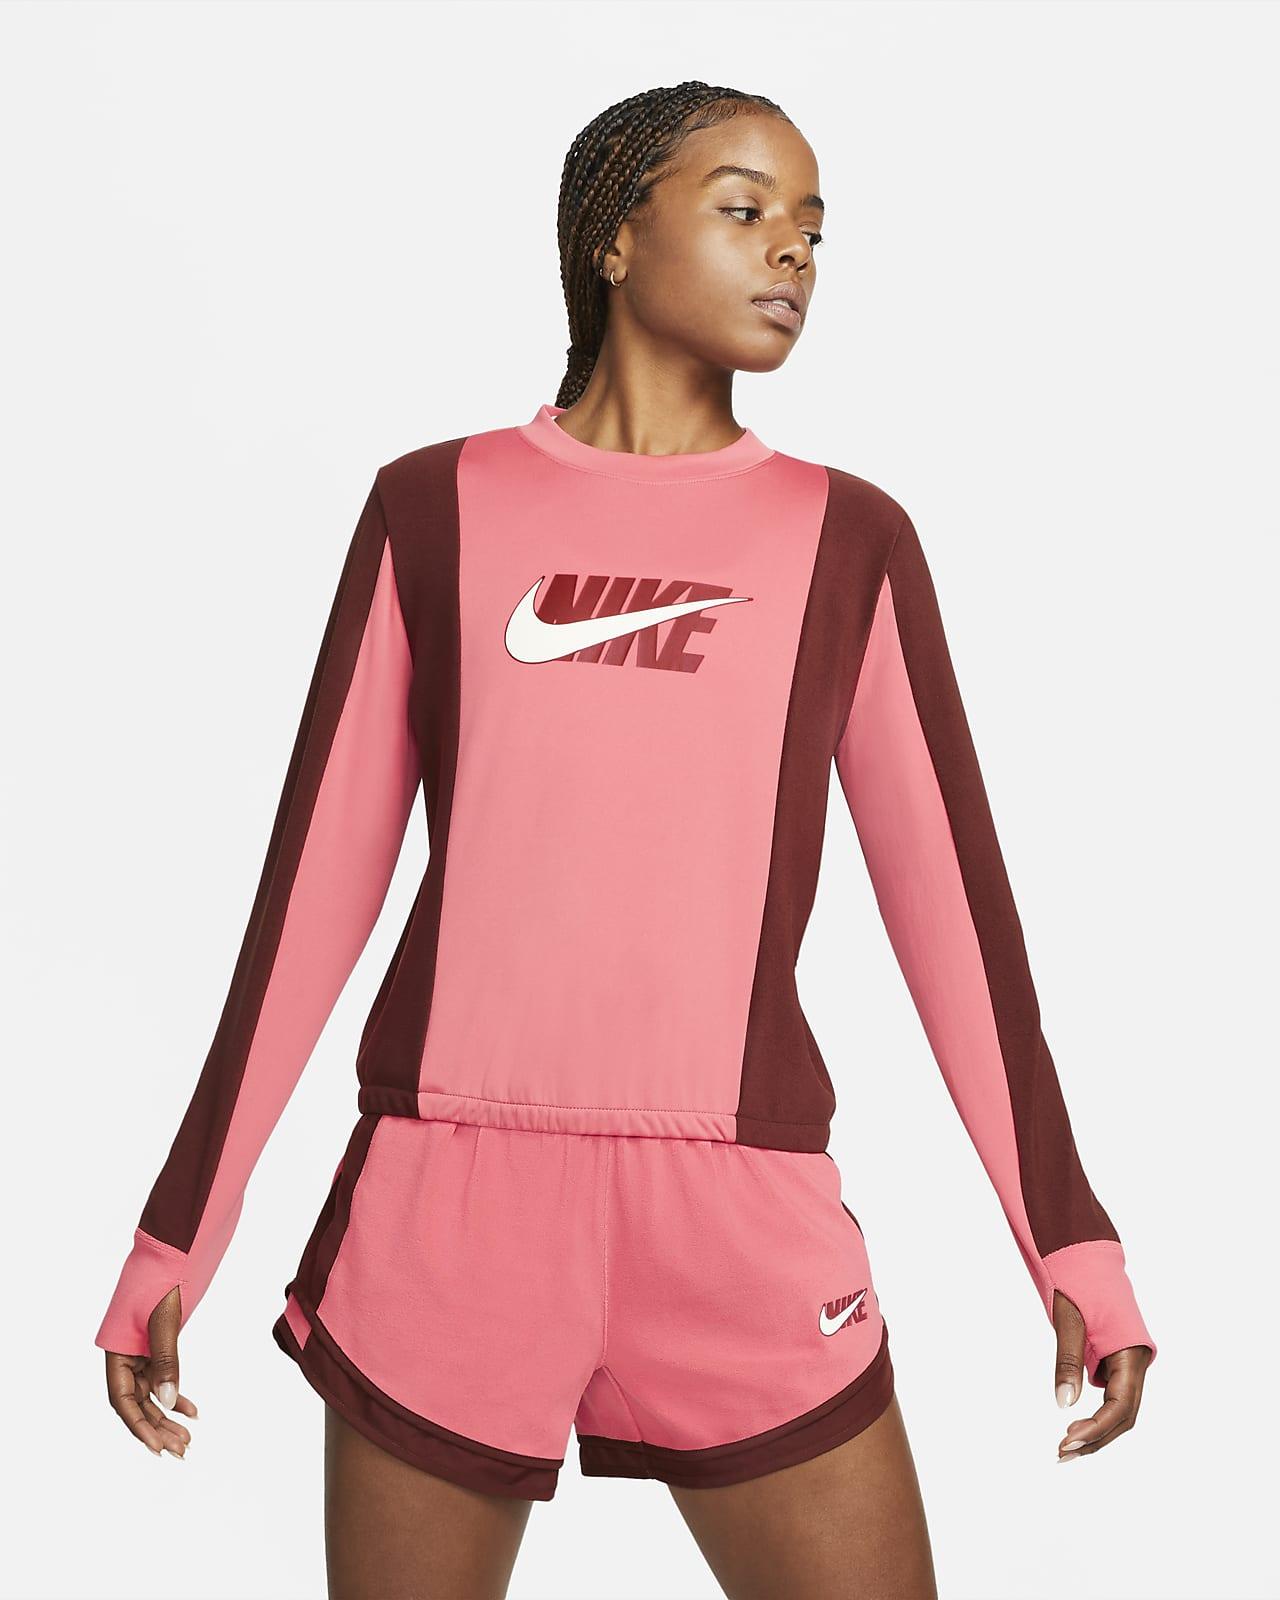 Mellanlagertröja Nike Dri-FIT Icon Clash för kvinnor